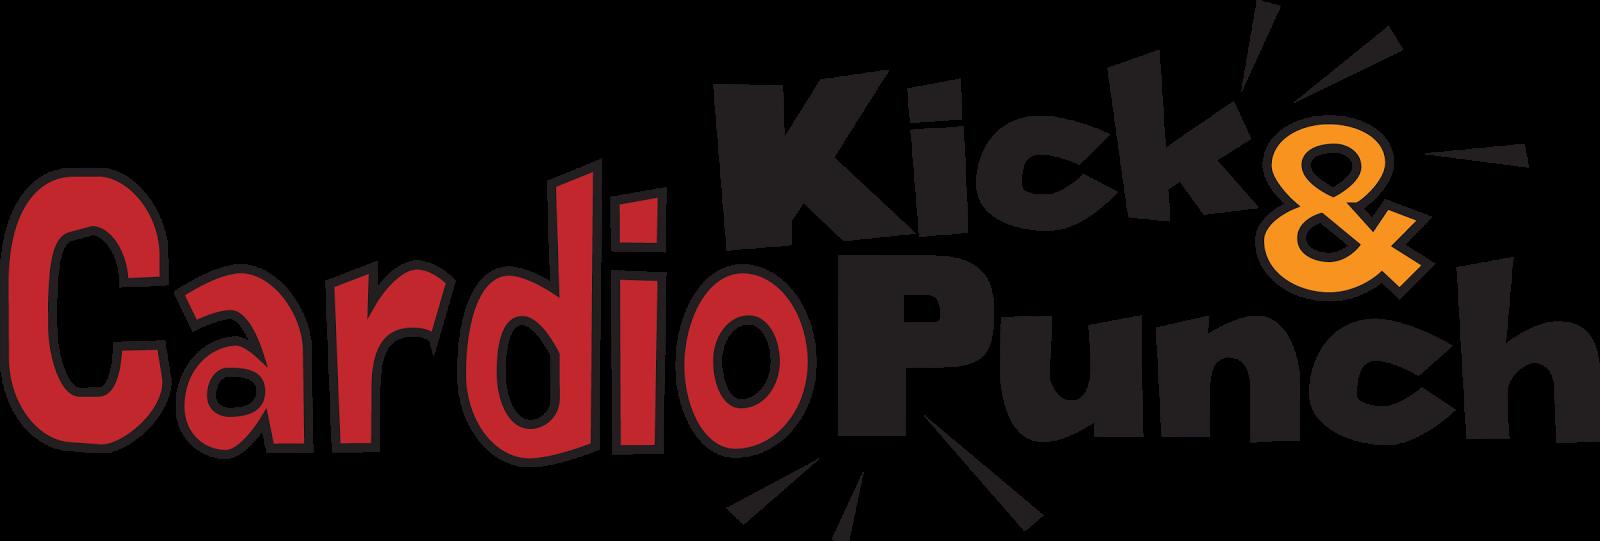 Cardio Kick and Punch fitness class logo by Sarah Pecorino for The Zoo Health Club NH